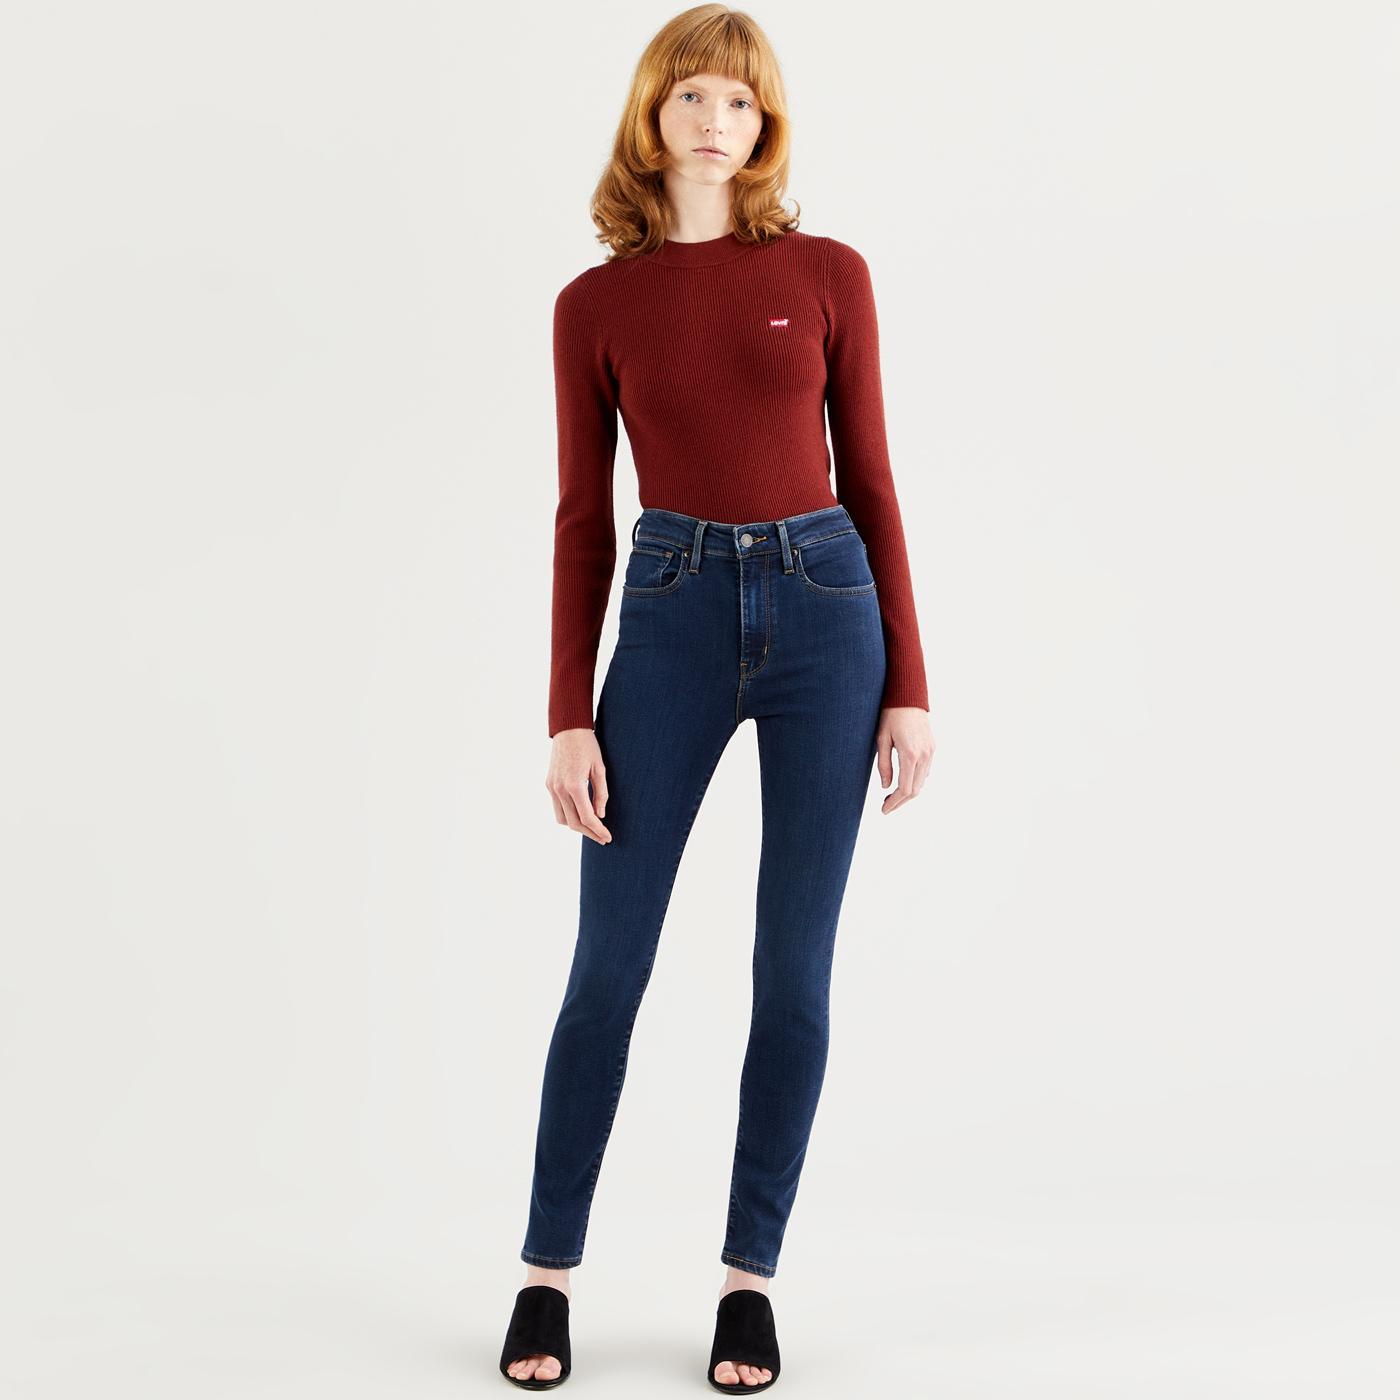 LEVI'S 721 High Rise Skinny Jeans (Santiago Night)